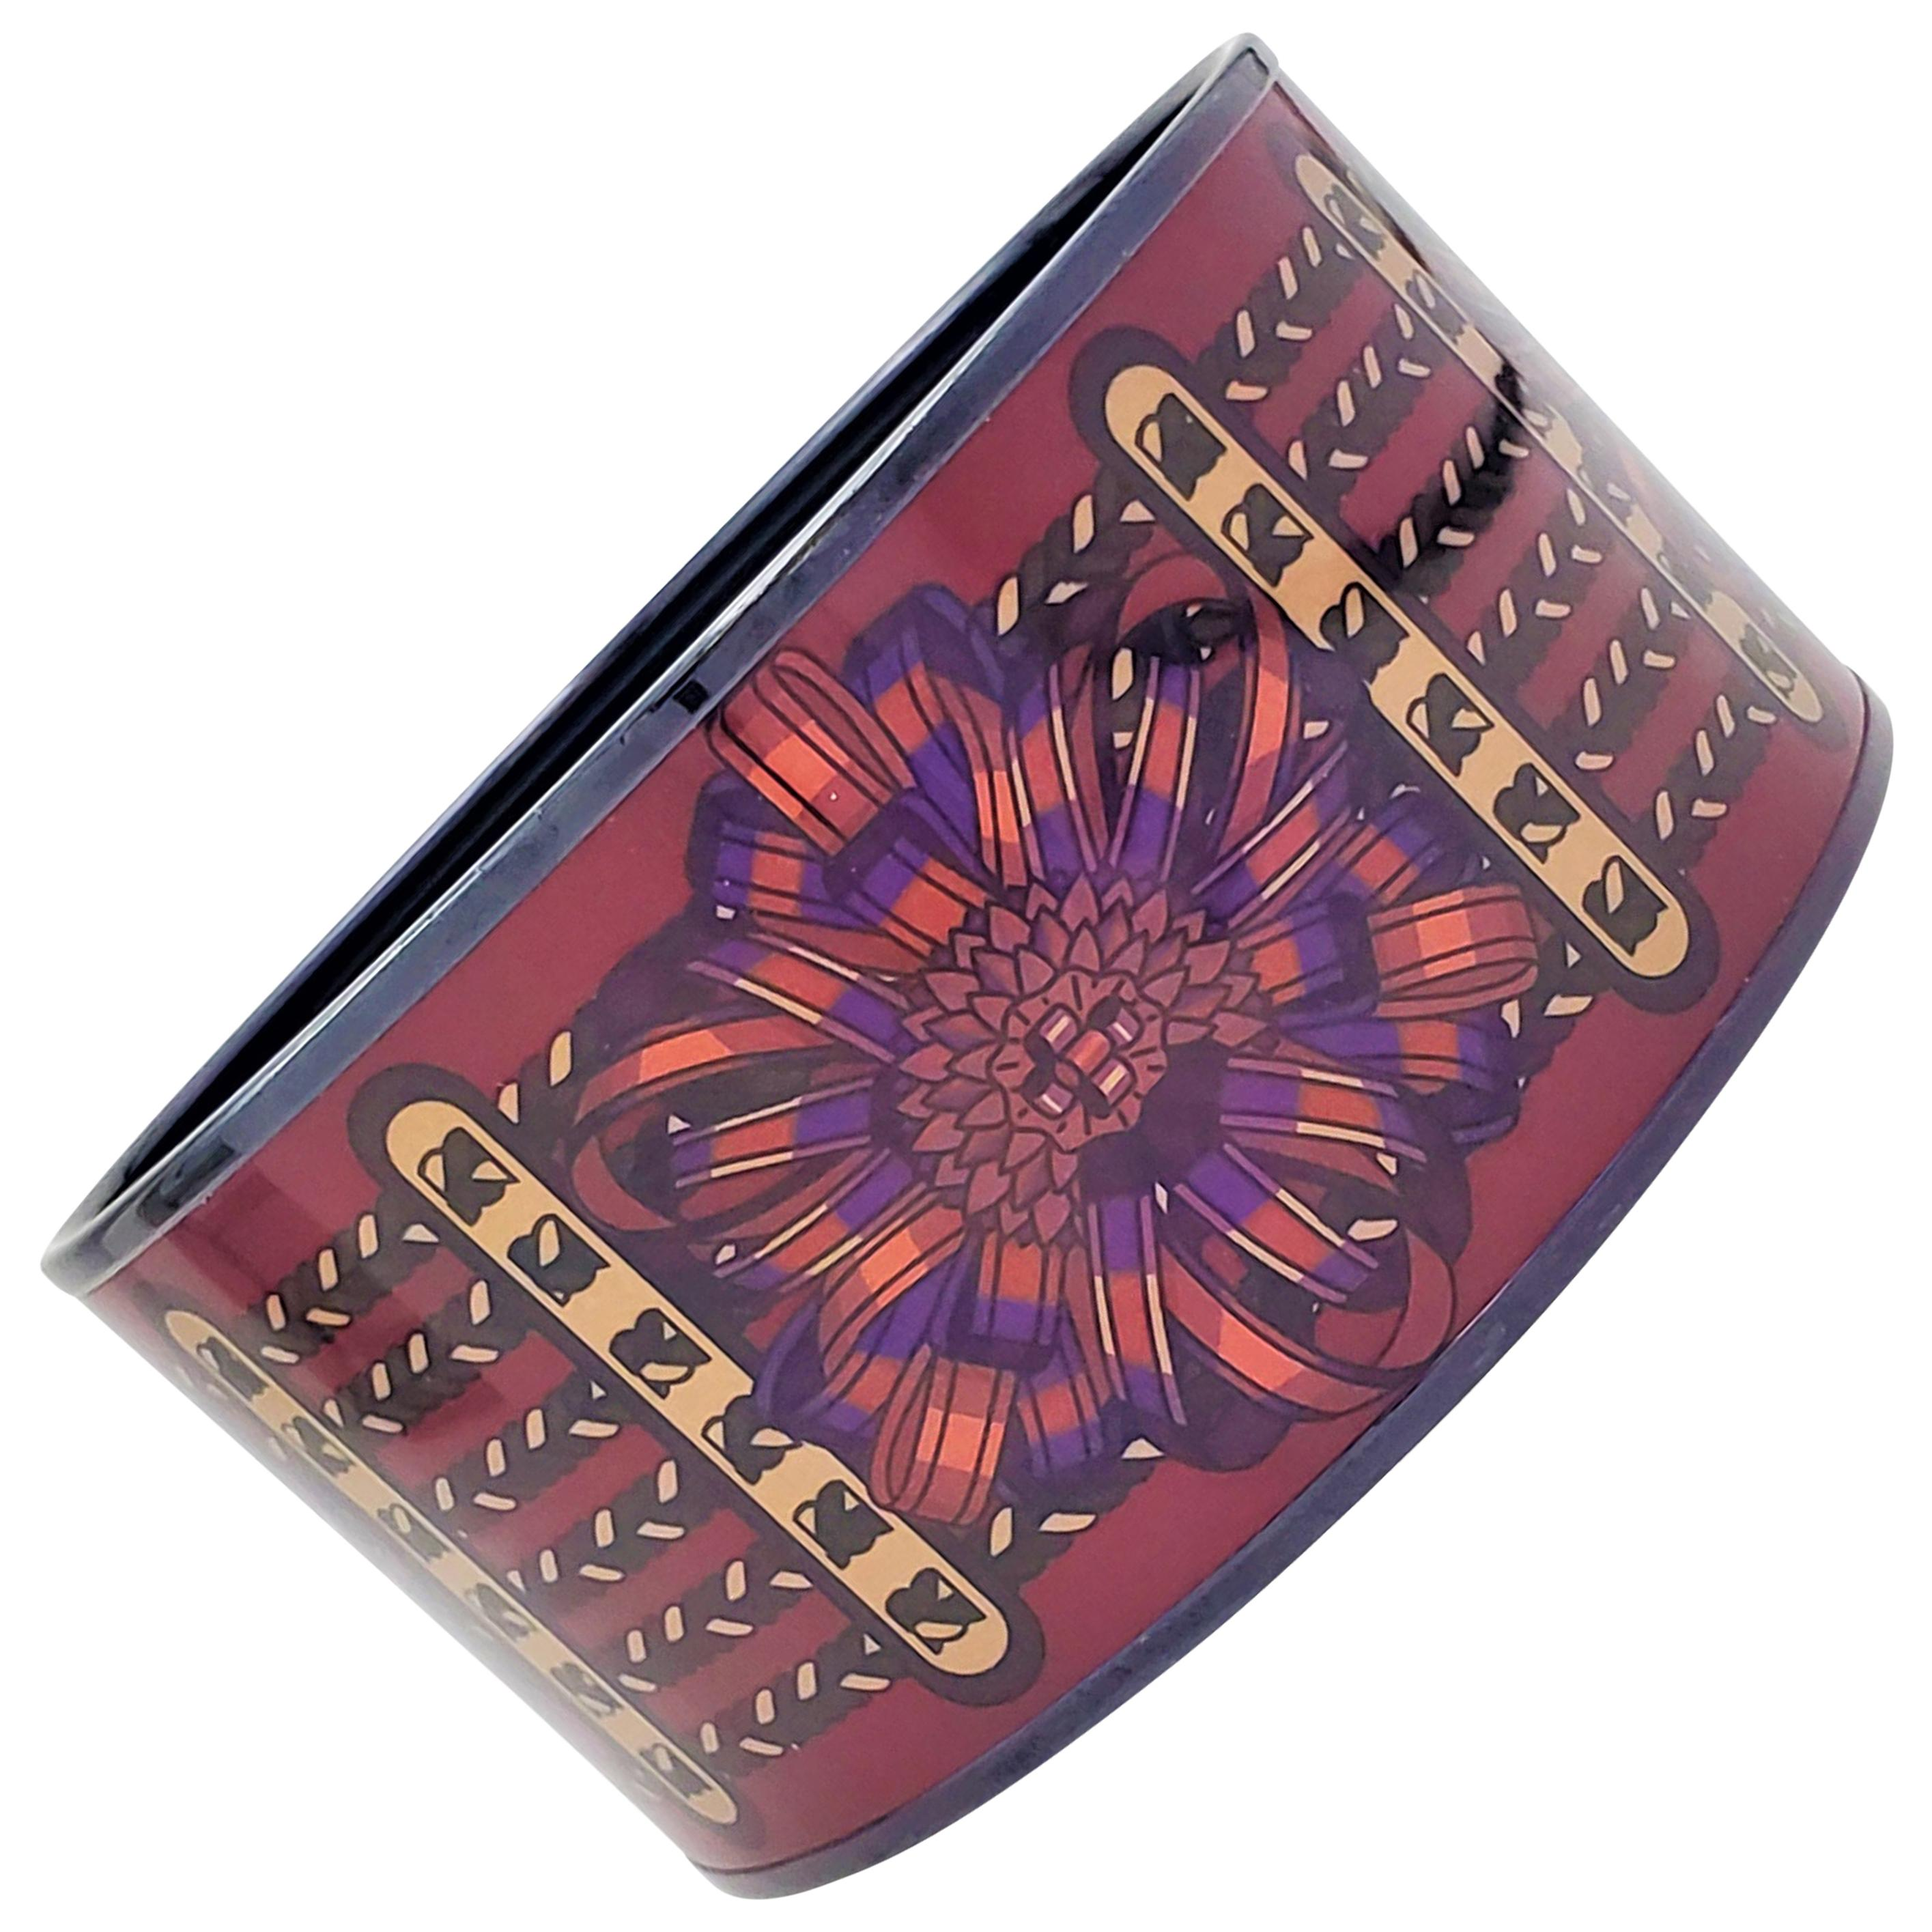 Hermès Enamel Wide Bangle Bracelet